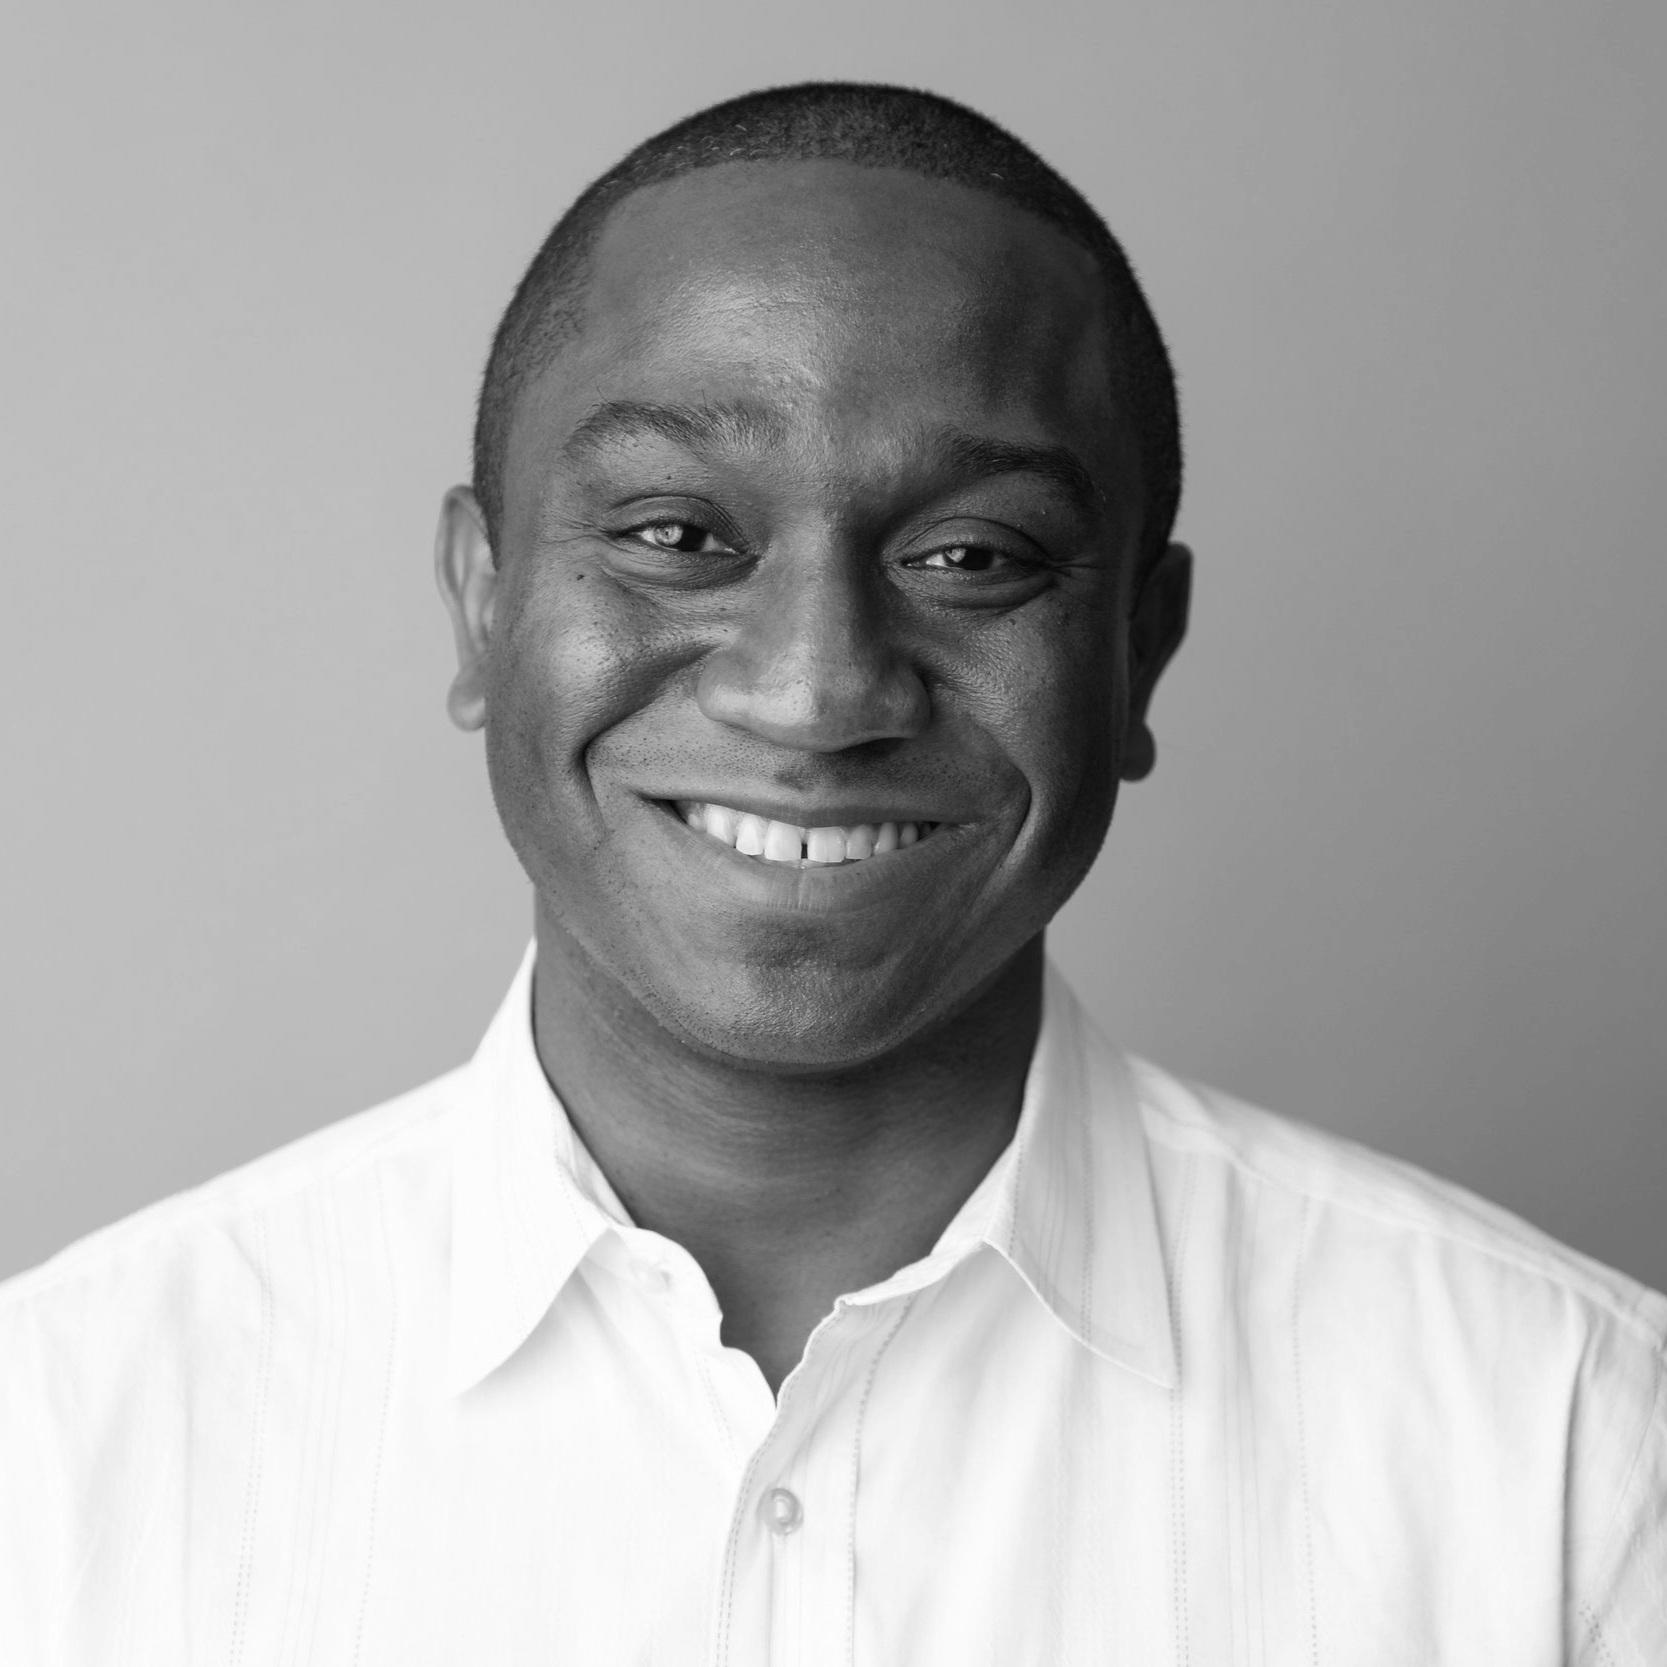 Vermon Pierre - Agapist Fellowship Director